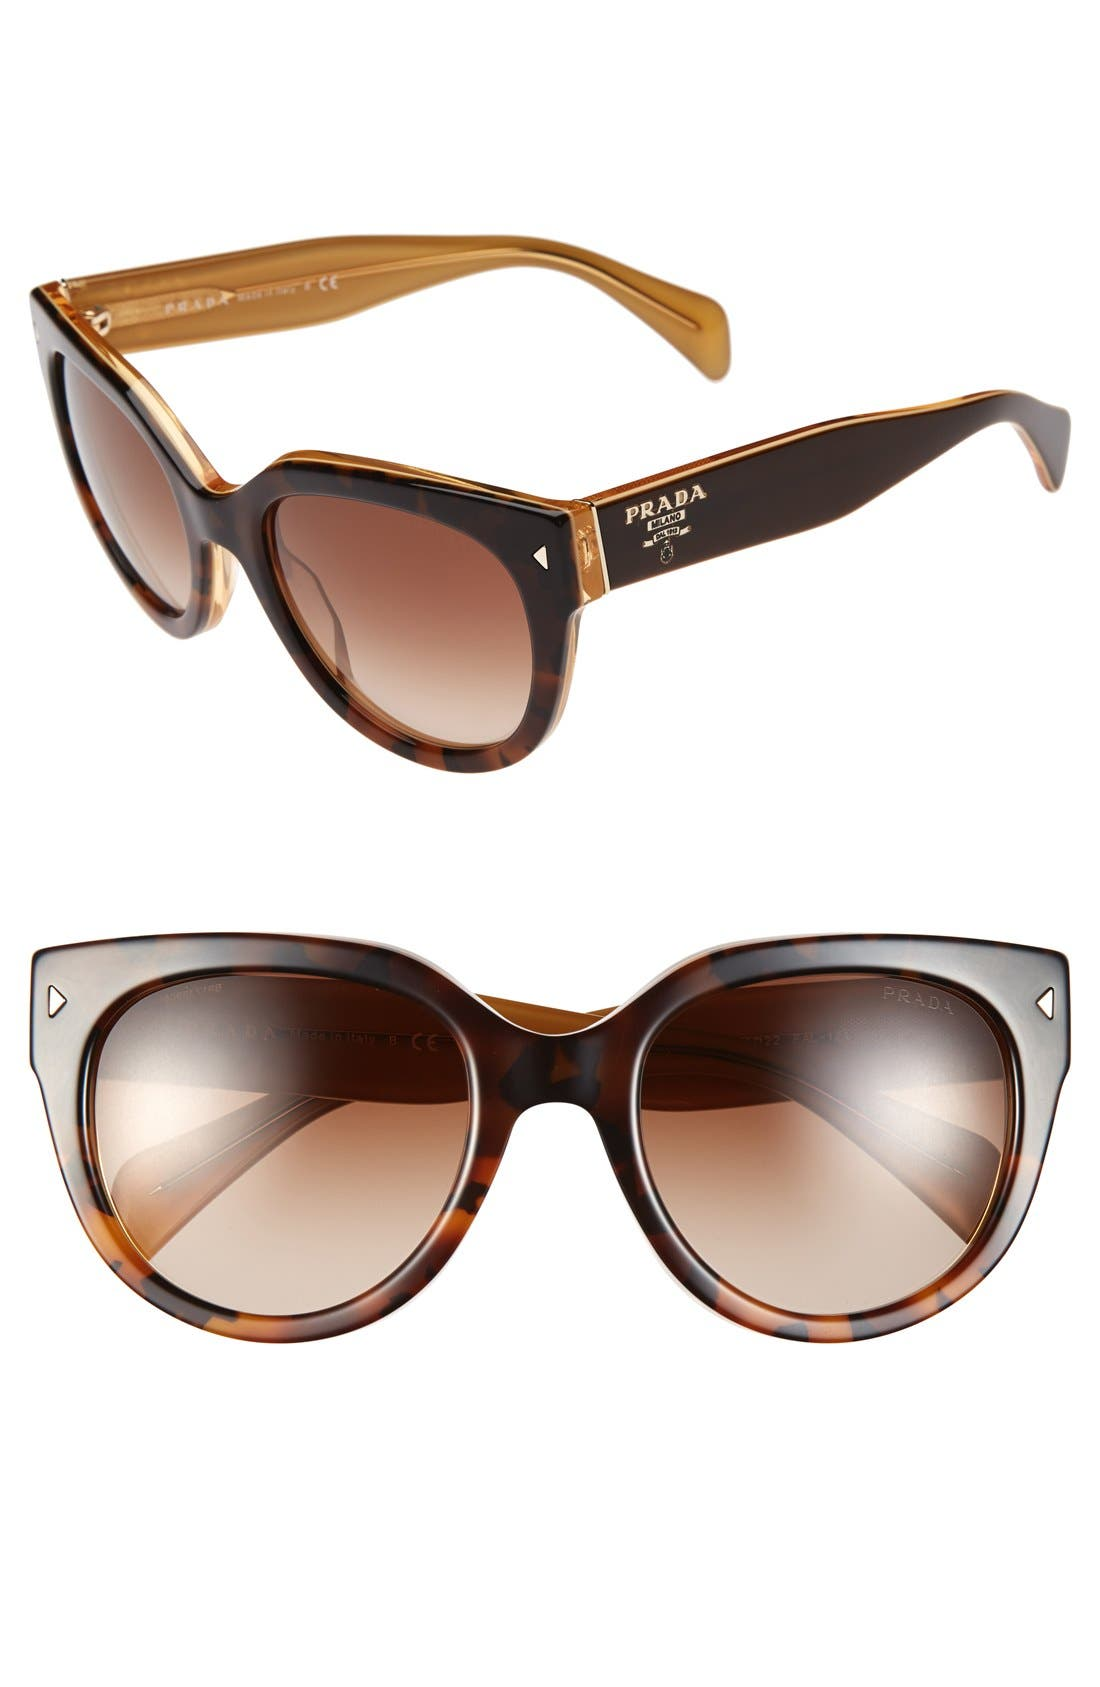 54mm Cat Eye Sunglasses,                         Main,                         color, Yellow Tortoise